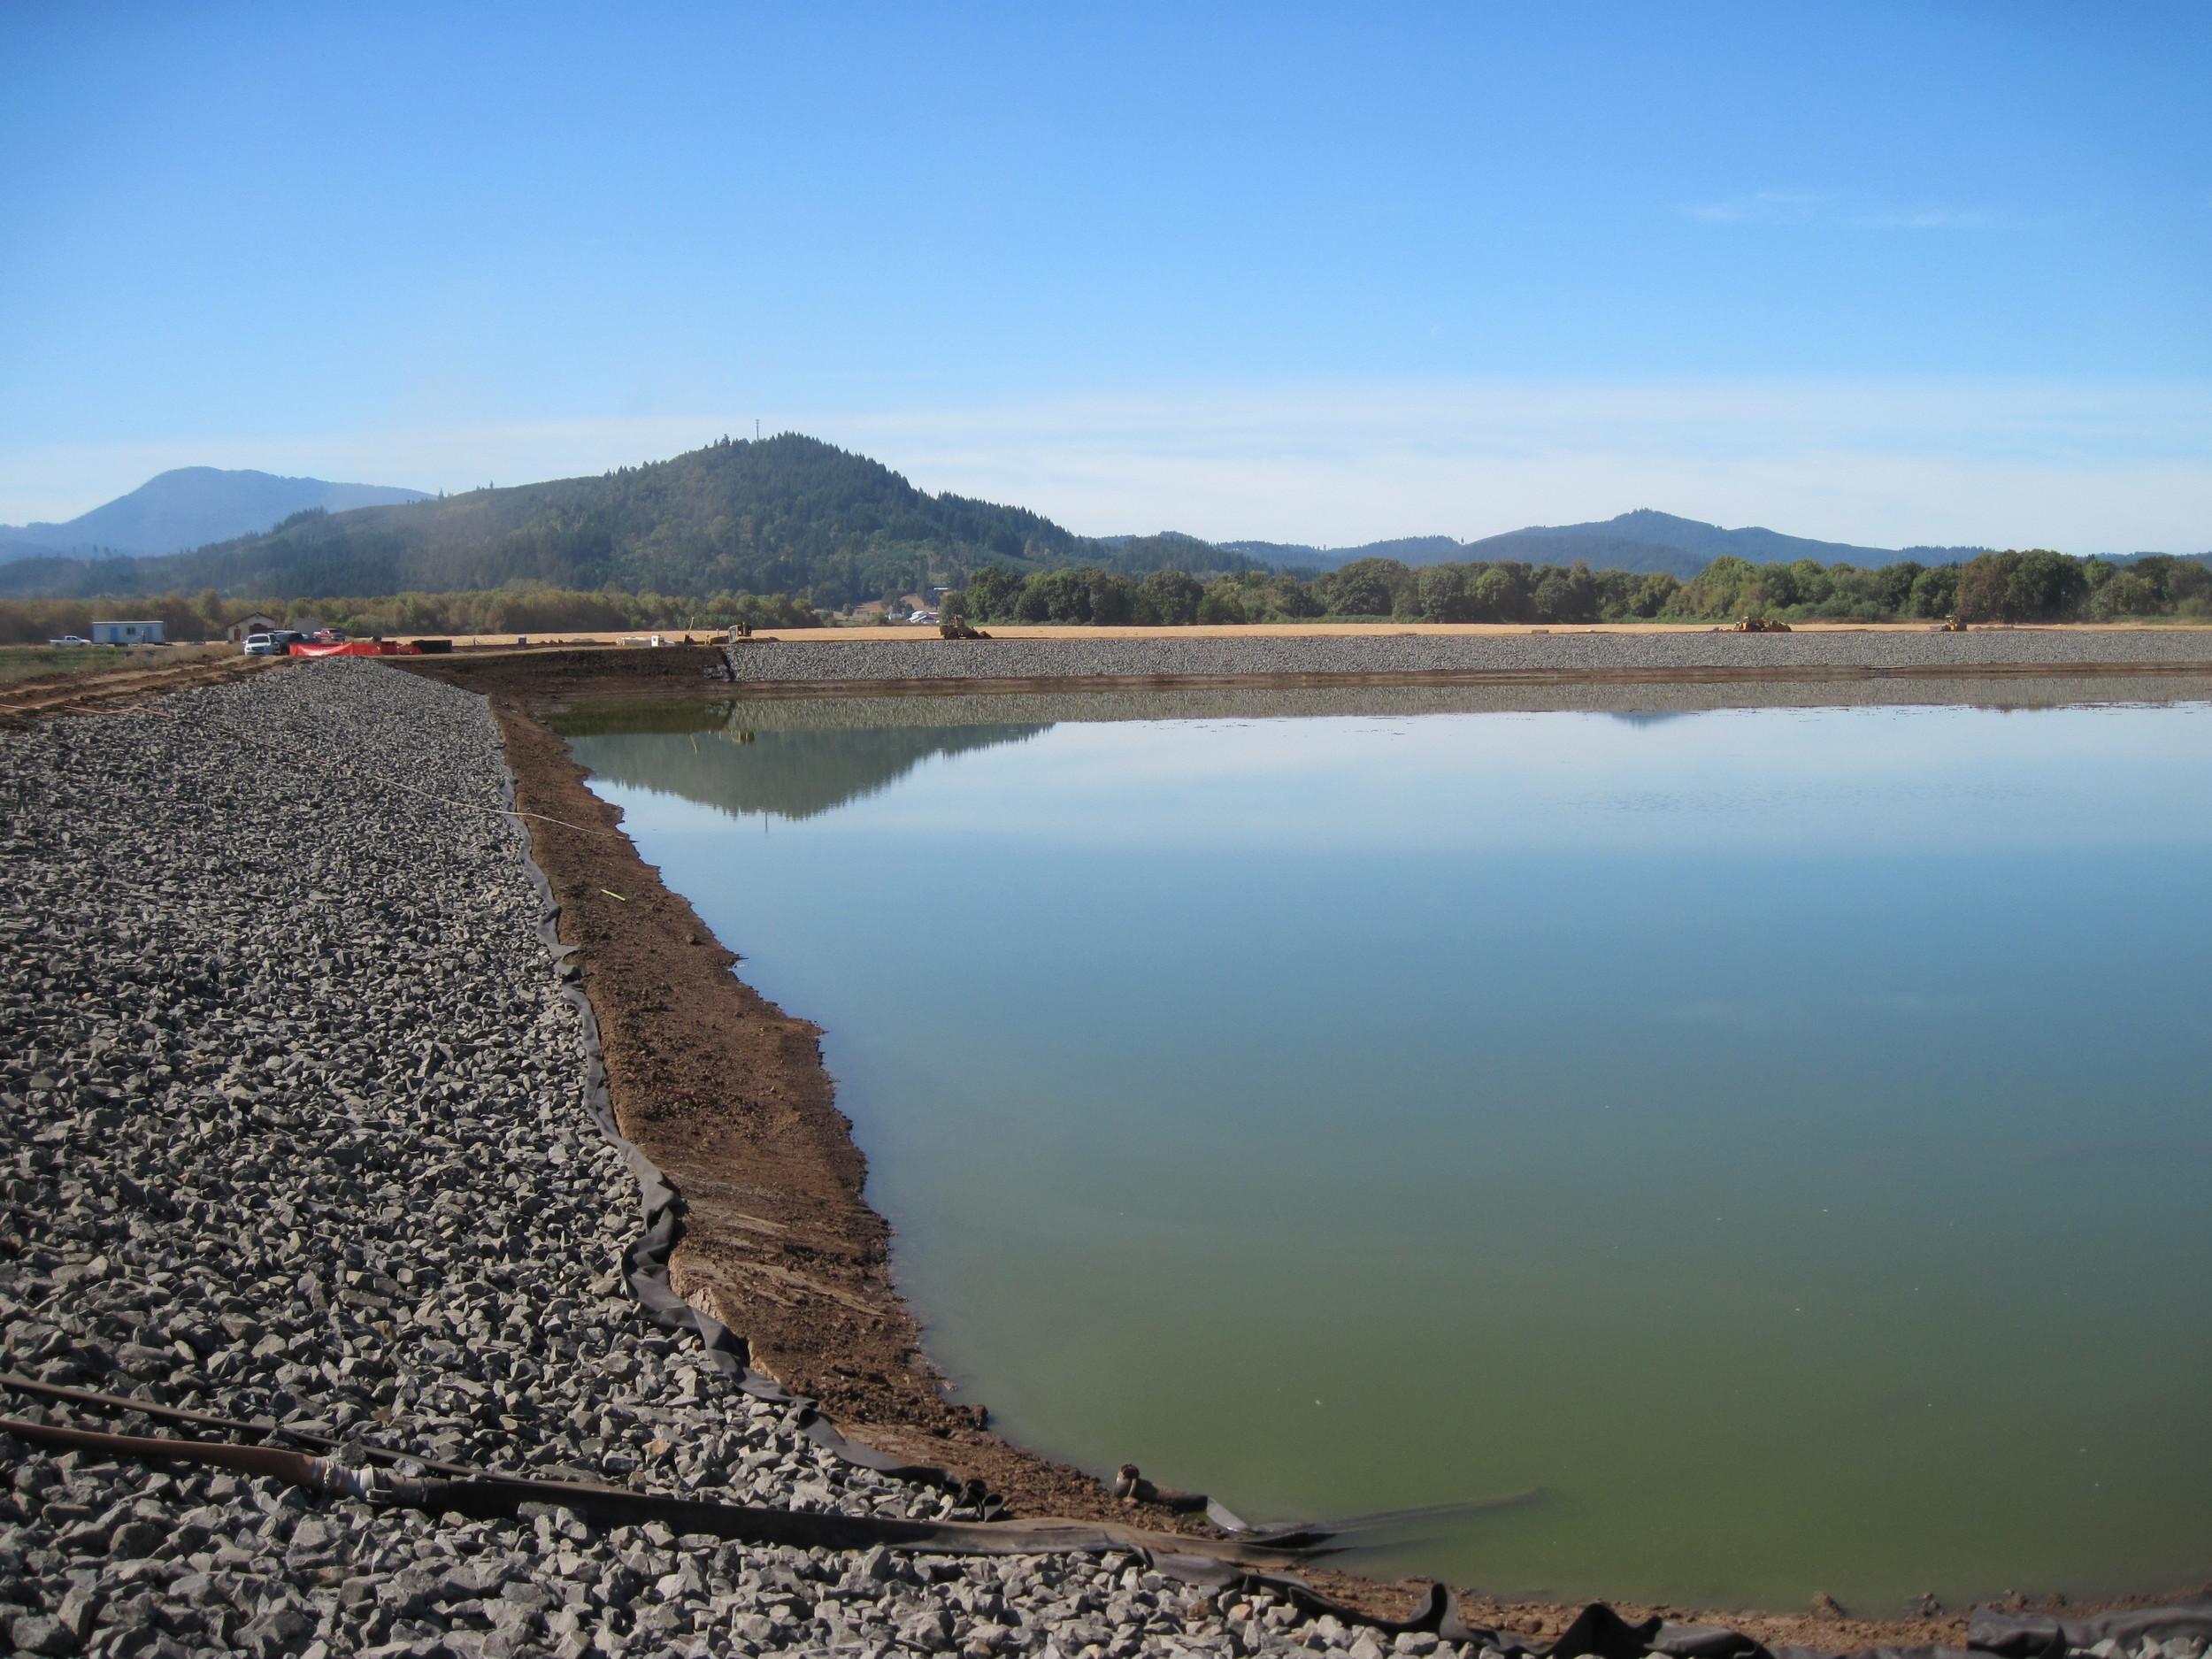 Philomath Wastewater Treatment Plant Lagpons | Philomath, Oregon